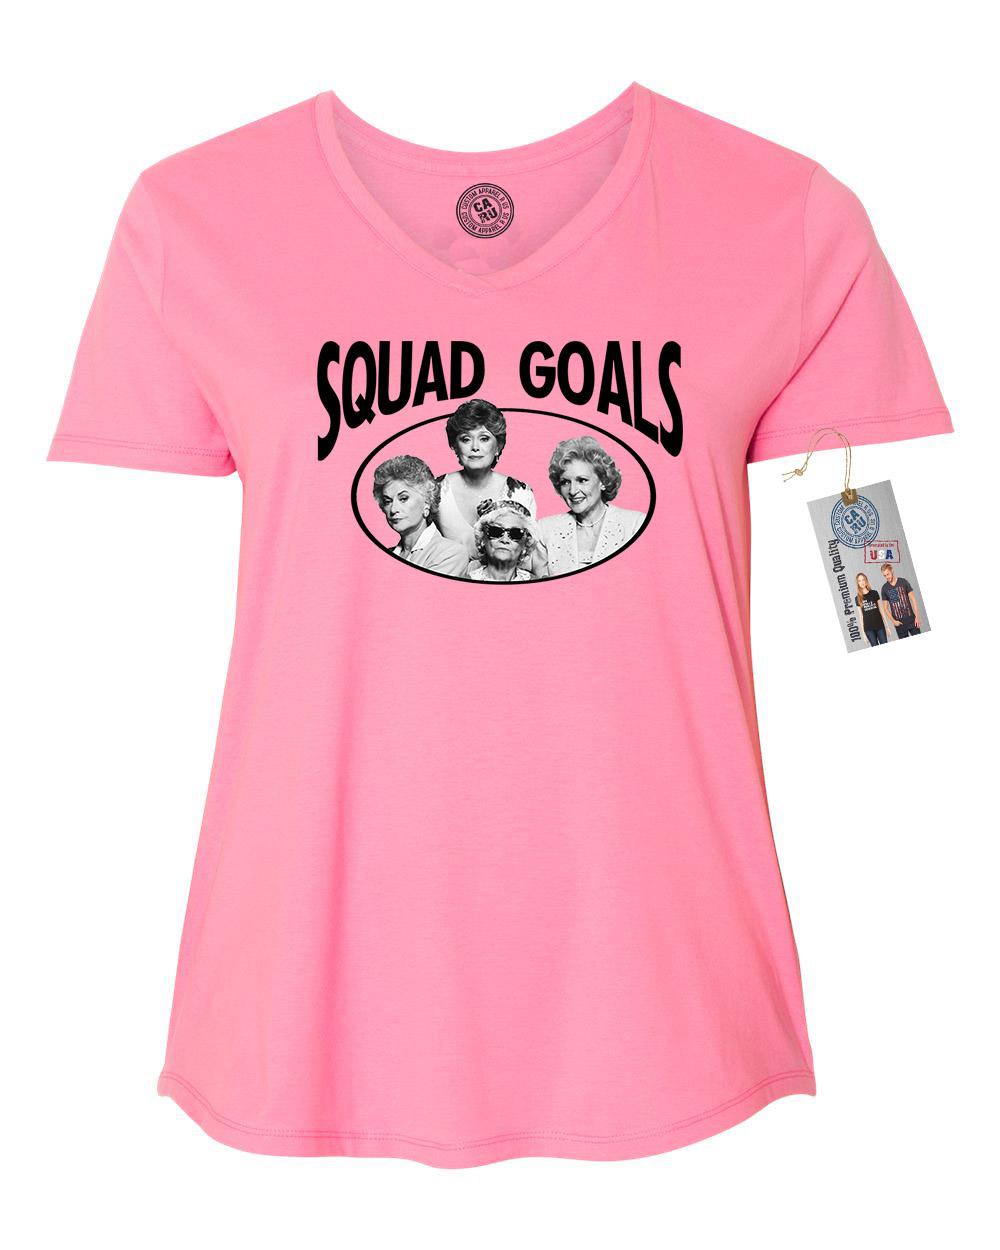 Golden Girls TV Show Squad Goals Plus Size Womens VNeck Shirt Top